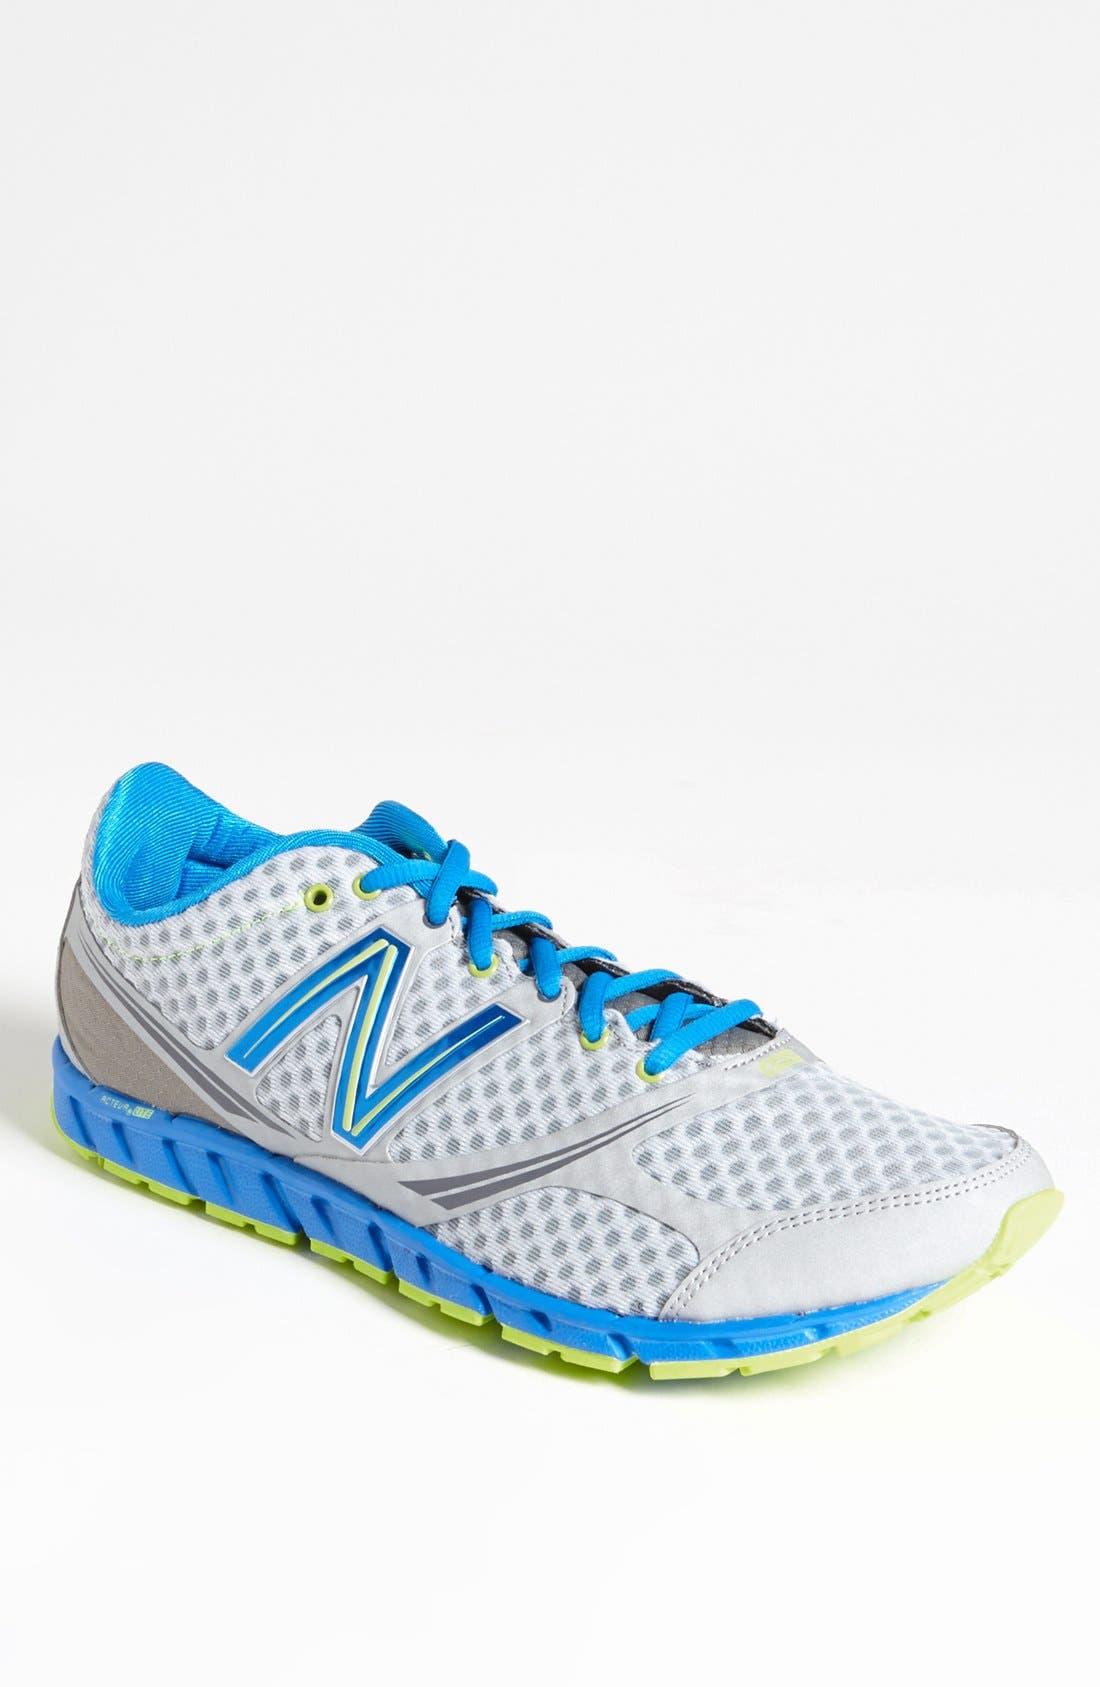 Main Image - New Balance '730v2' Running Shoe (Men)